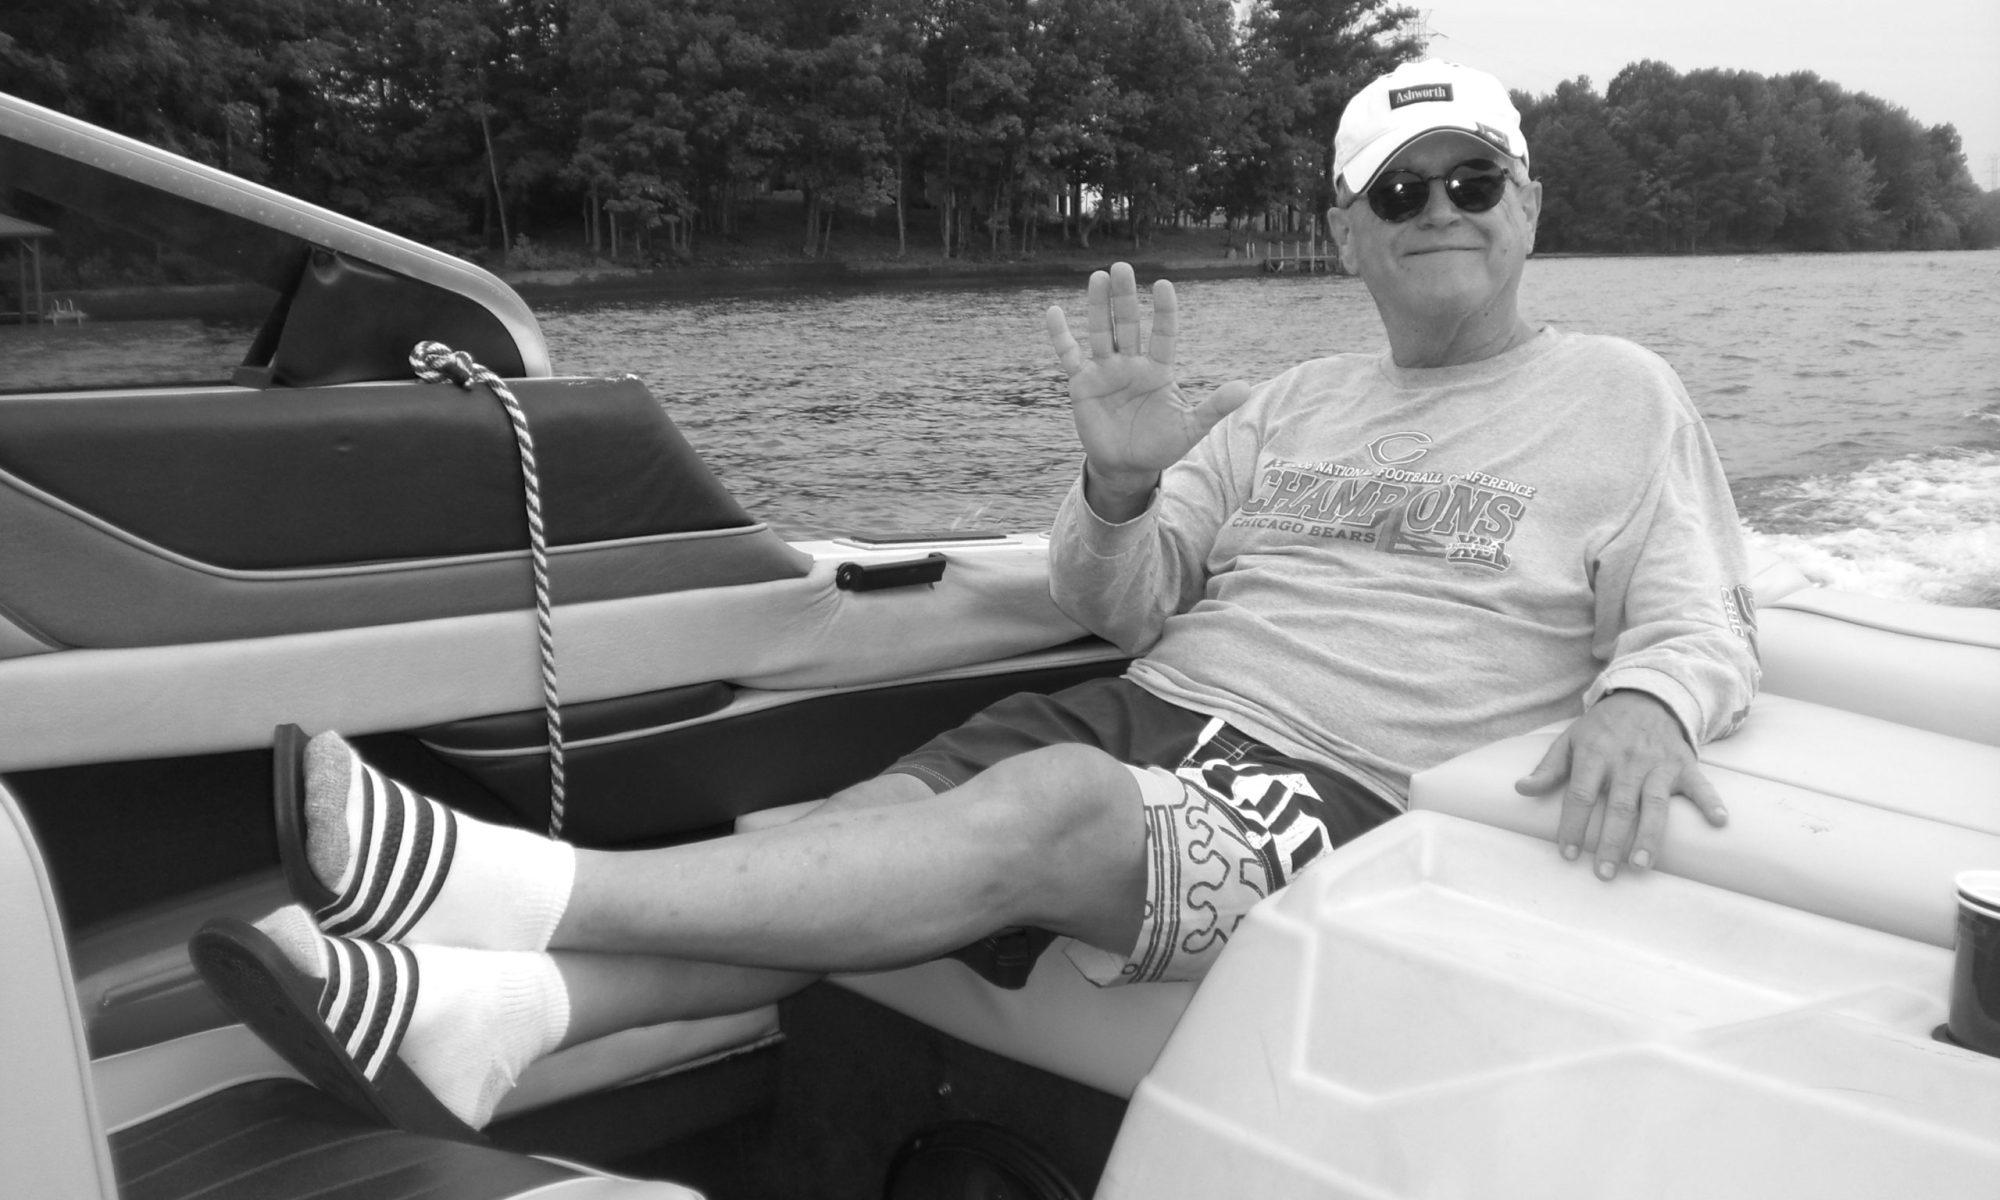 william j ashworth on the boat